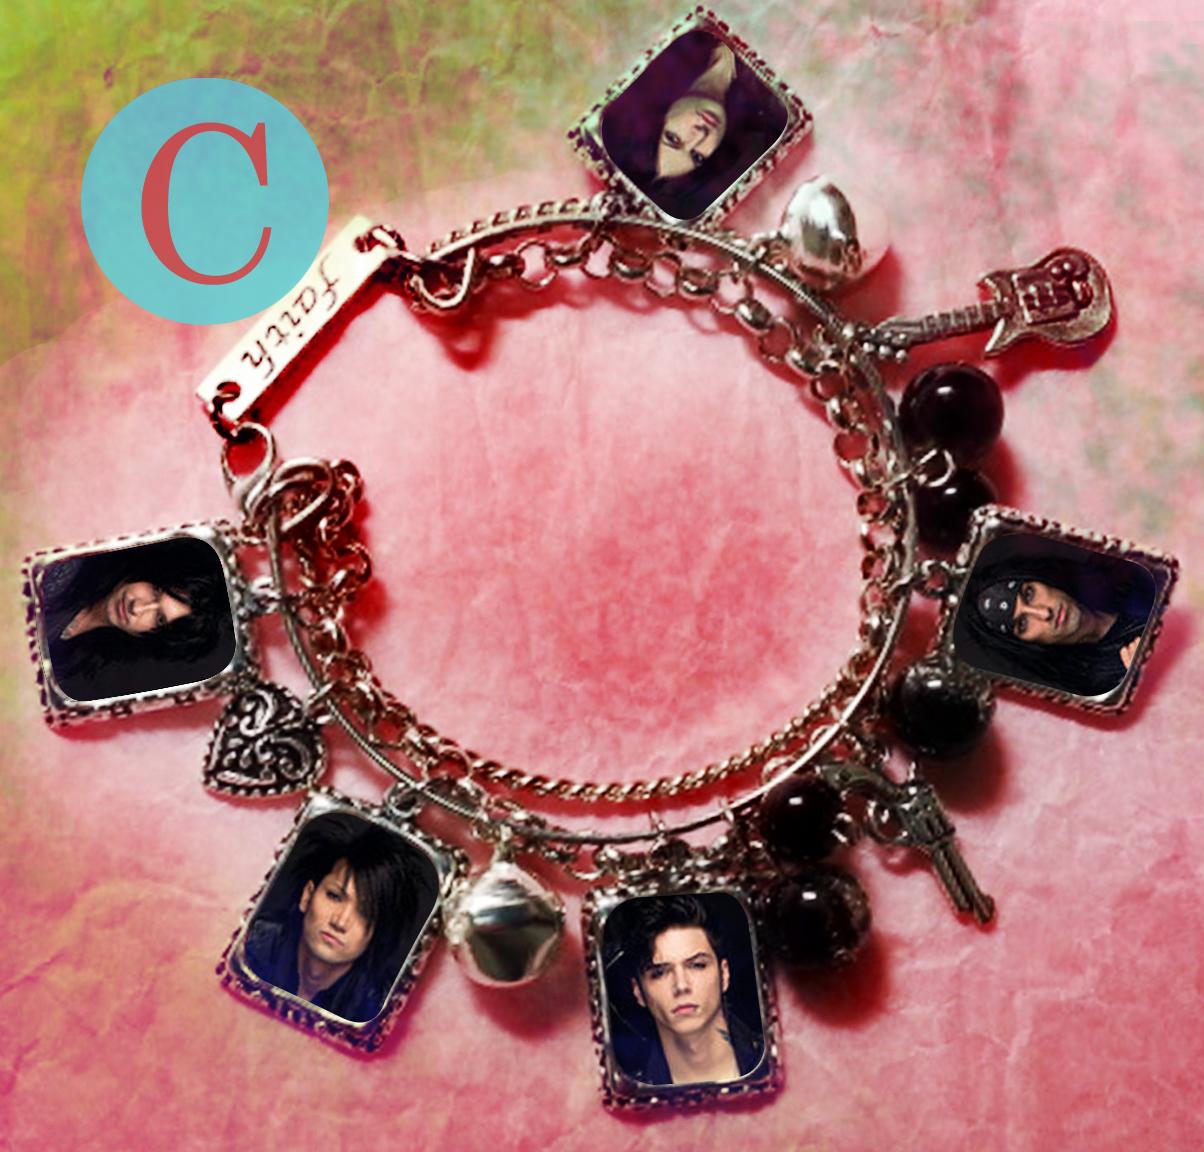 bvb_black_veil_brides_andy_biersack_charm_bangle_bracelets_2.jpg